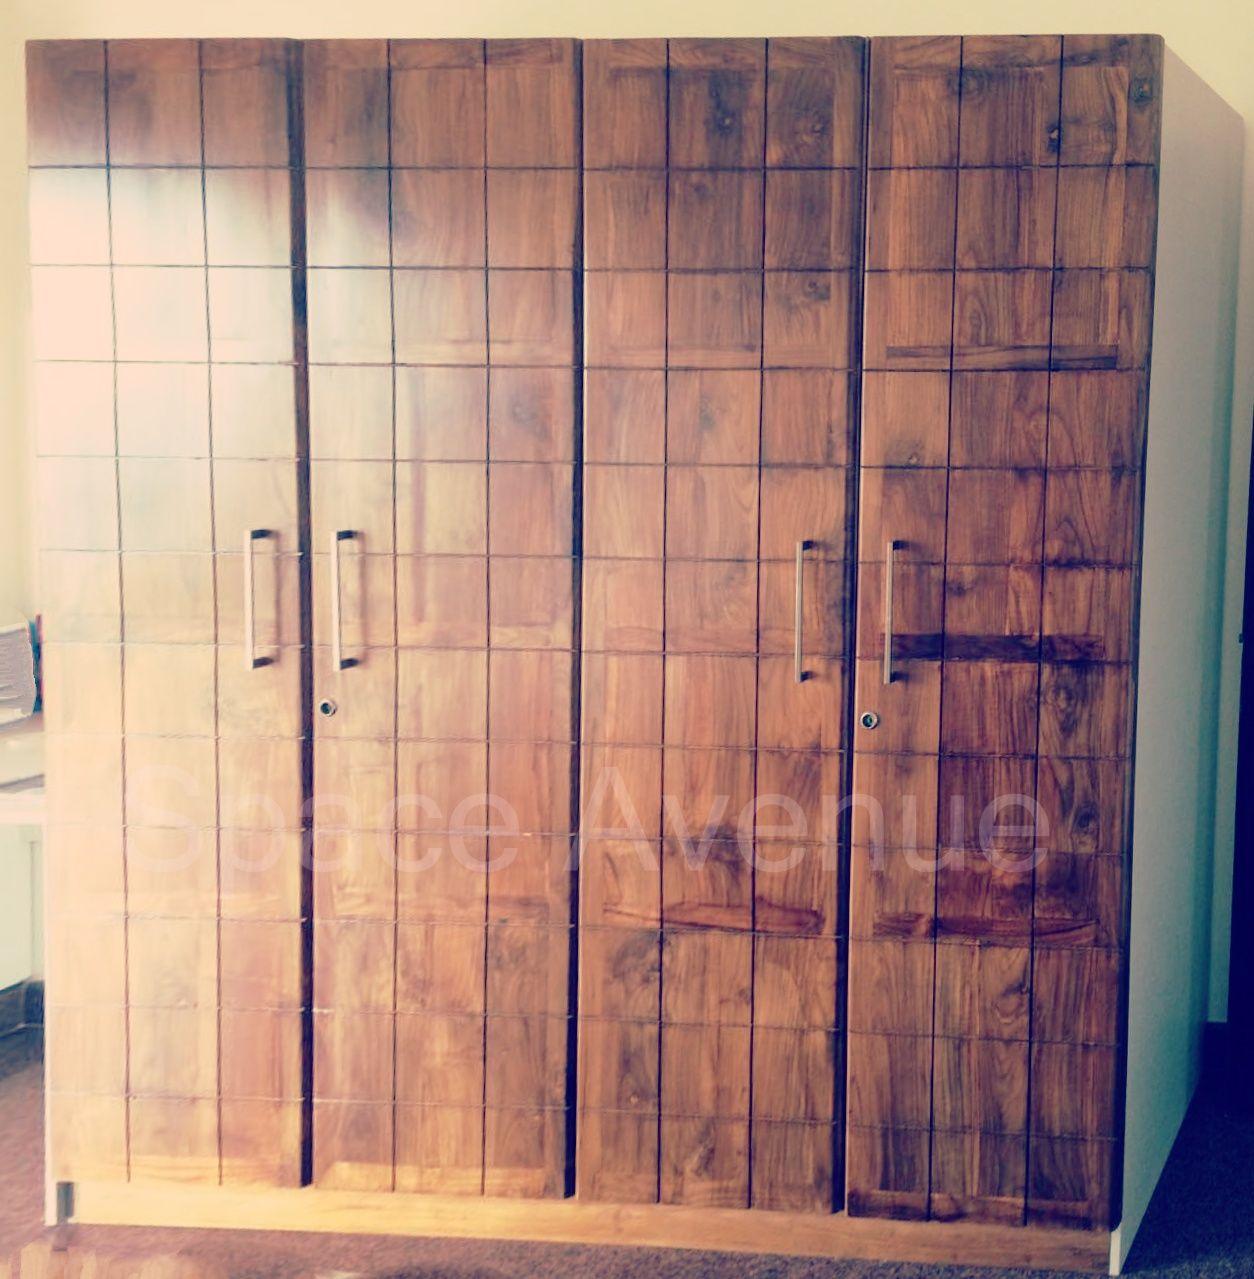 Living Room Interiordesign Bangalore: Wardrobe With Solid Wood Shutters #ModularWardrobe